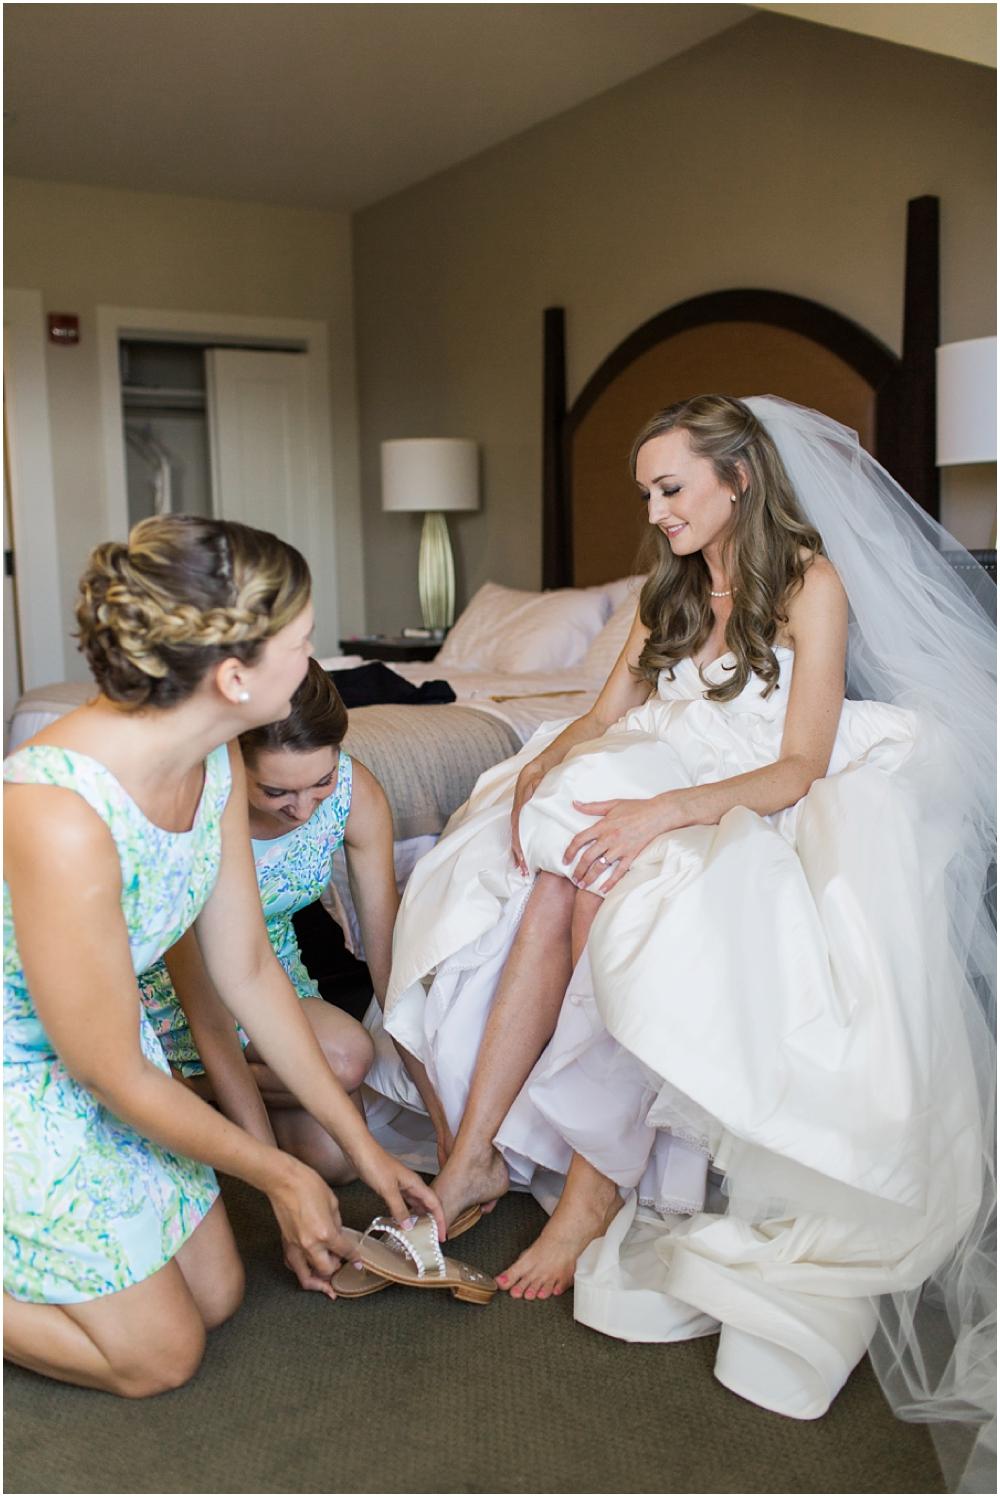 hudspeth_chesapeake_bay_beach_club_wedding_eastern_shore_wedding_photographer_0022